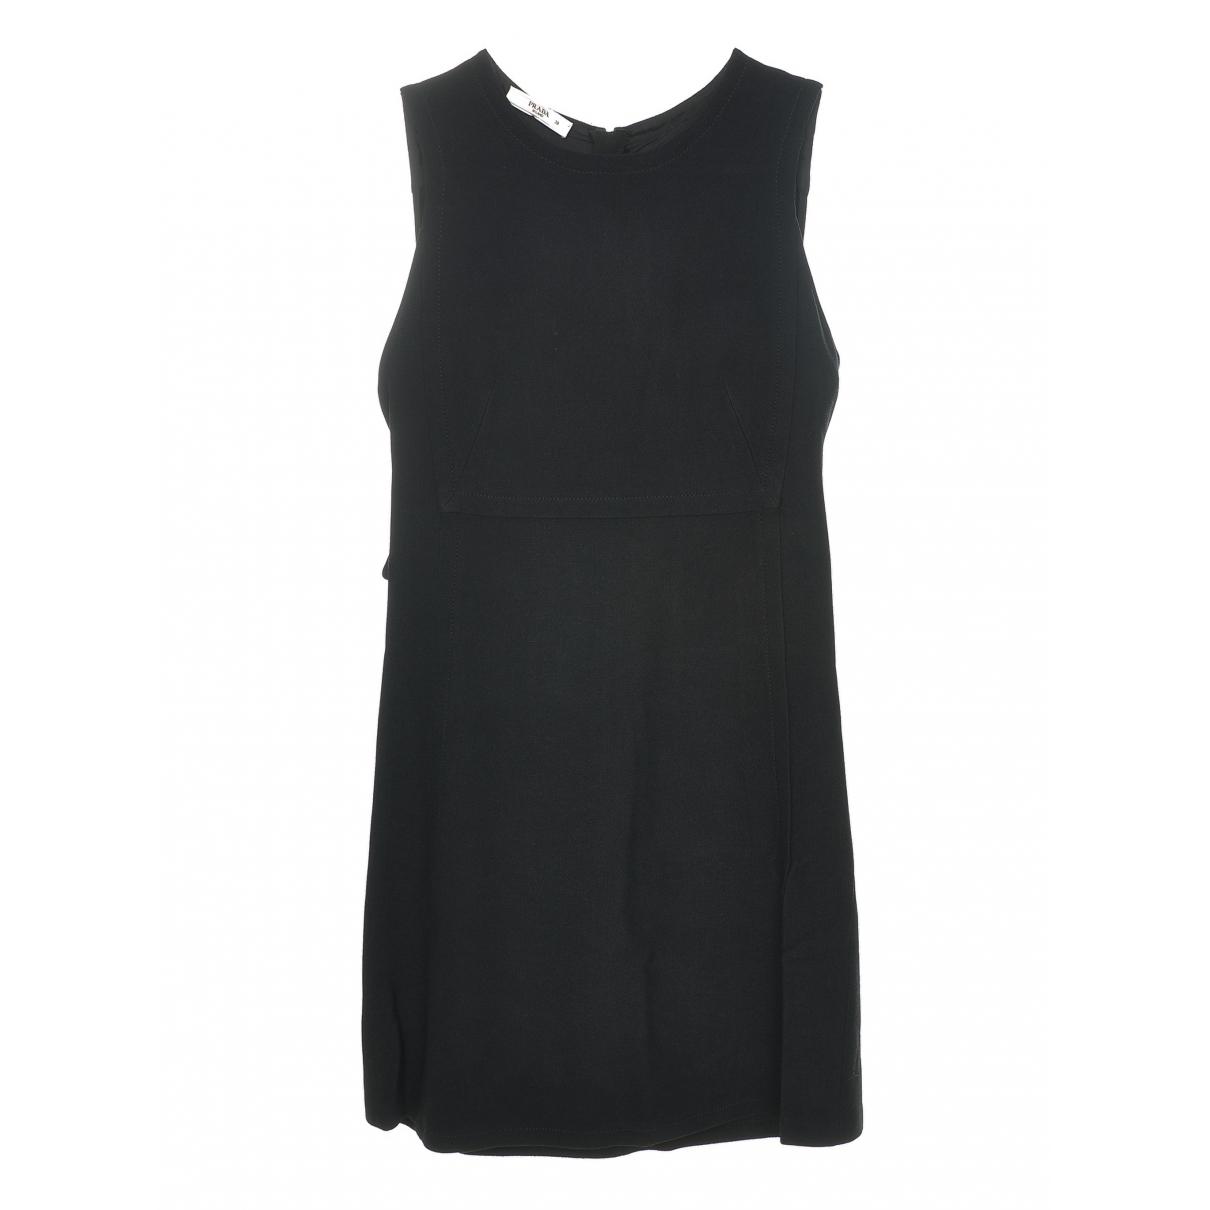 Prada \N Black Cotton dress for Women 38 IT